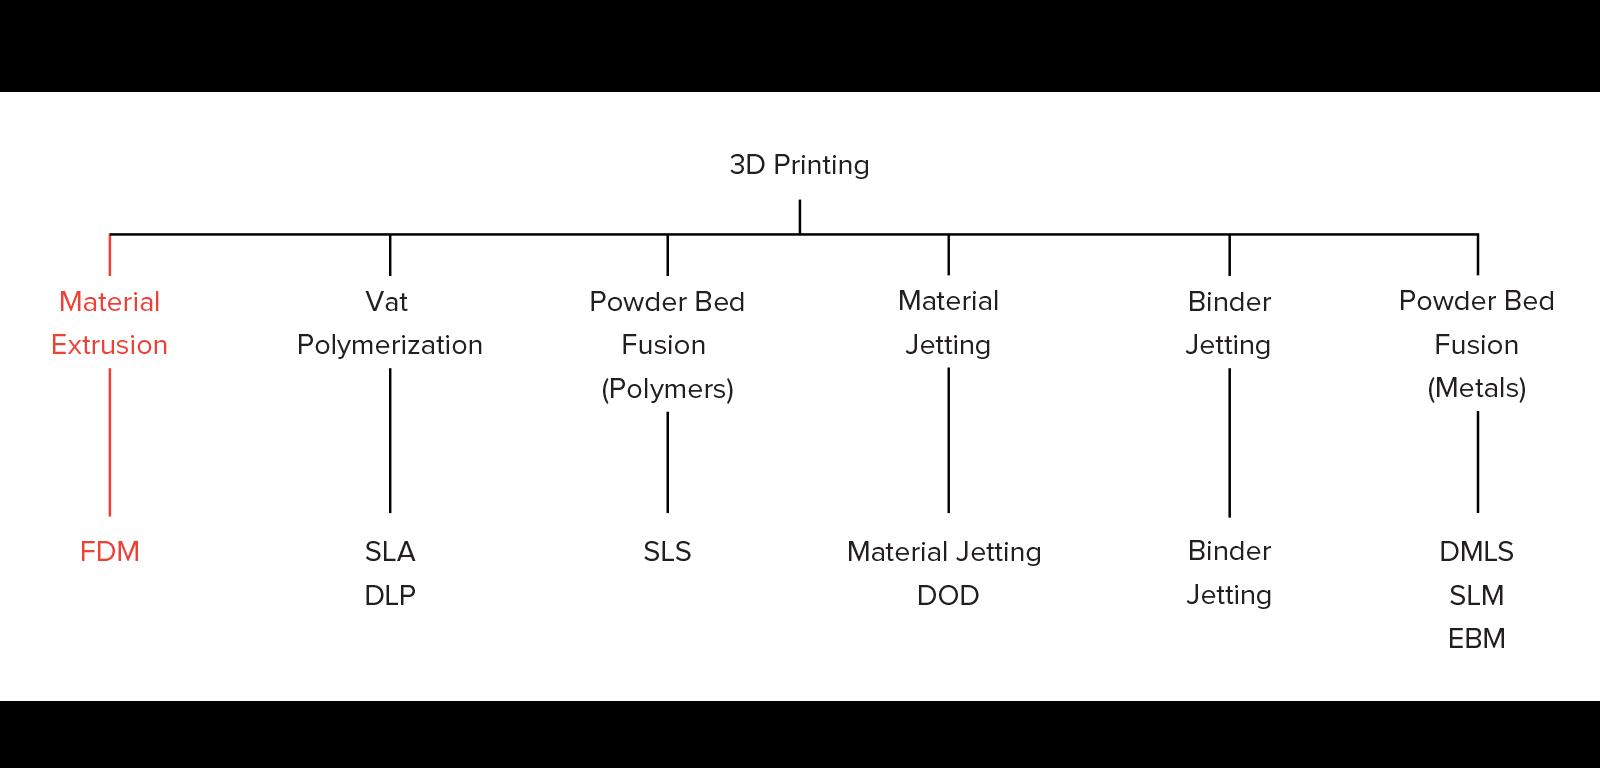 3d printing processes